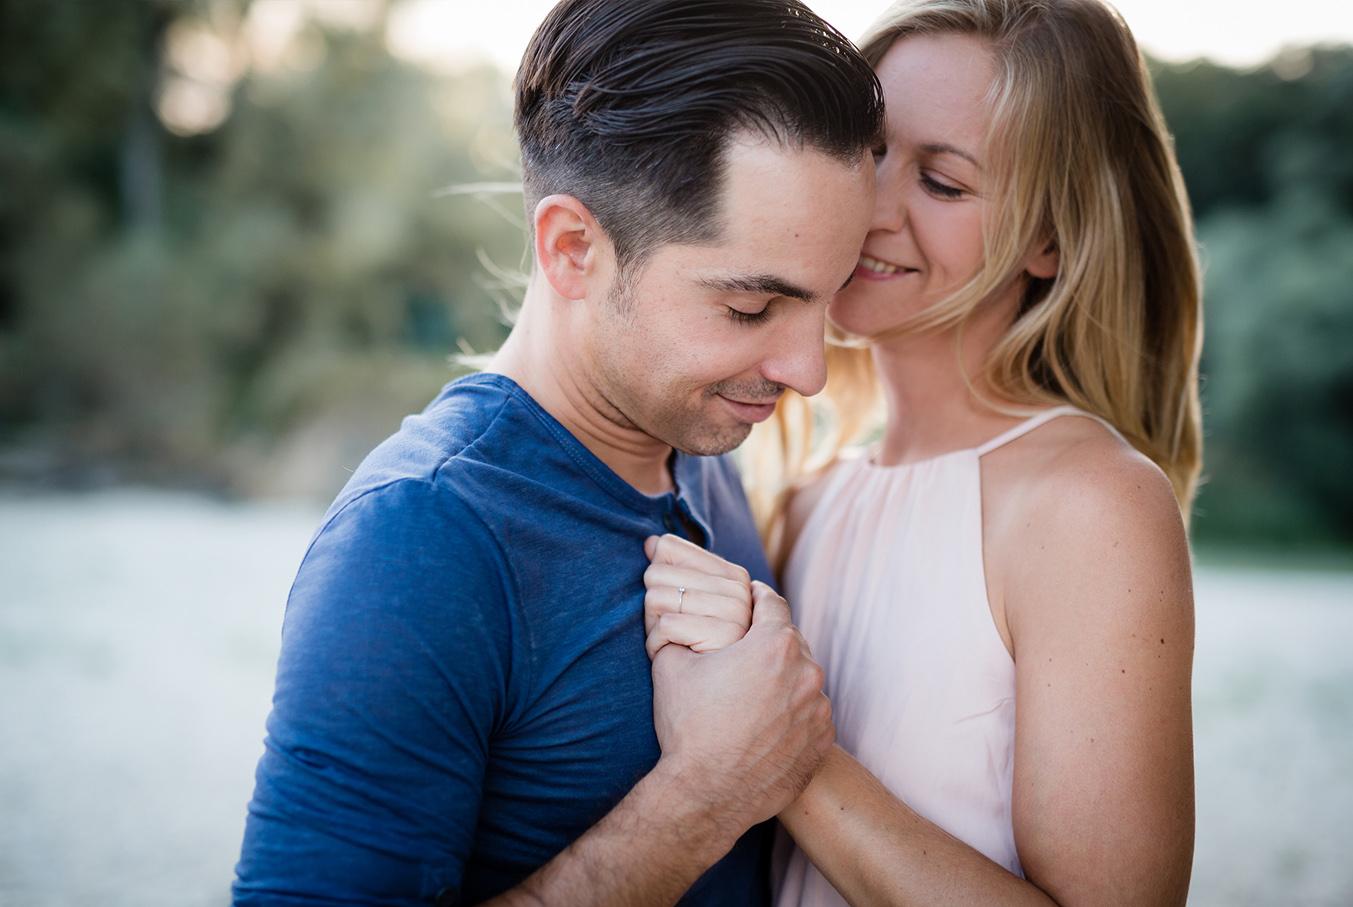 Vienna_Wien_Couple_Hochzeit_Paar_Verlobung_Engagement_Shooting_22